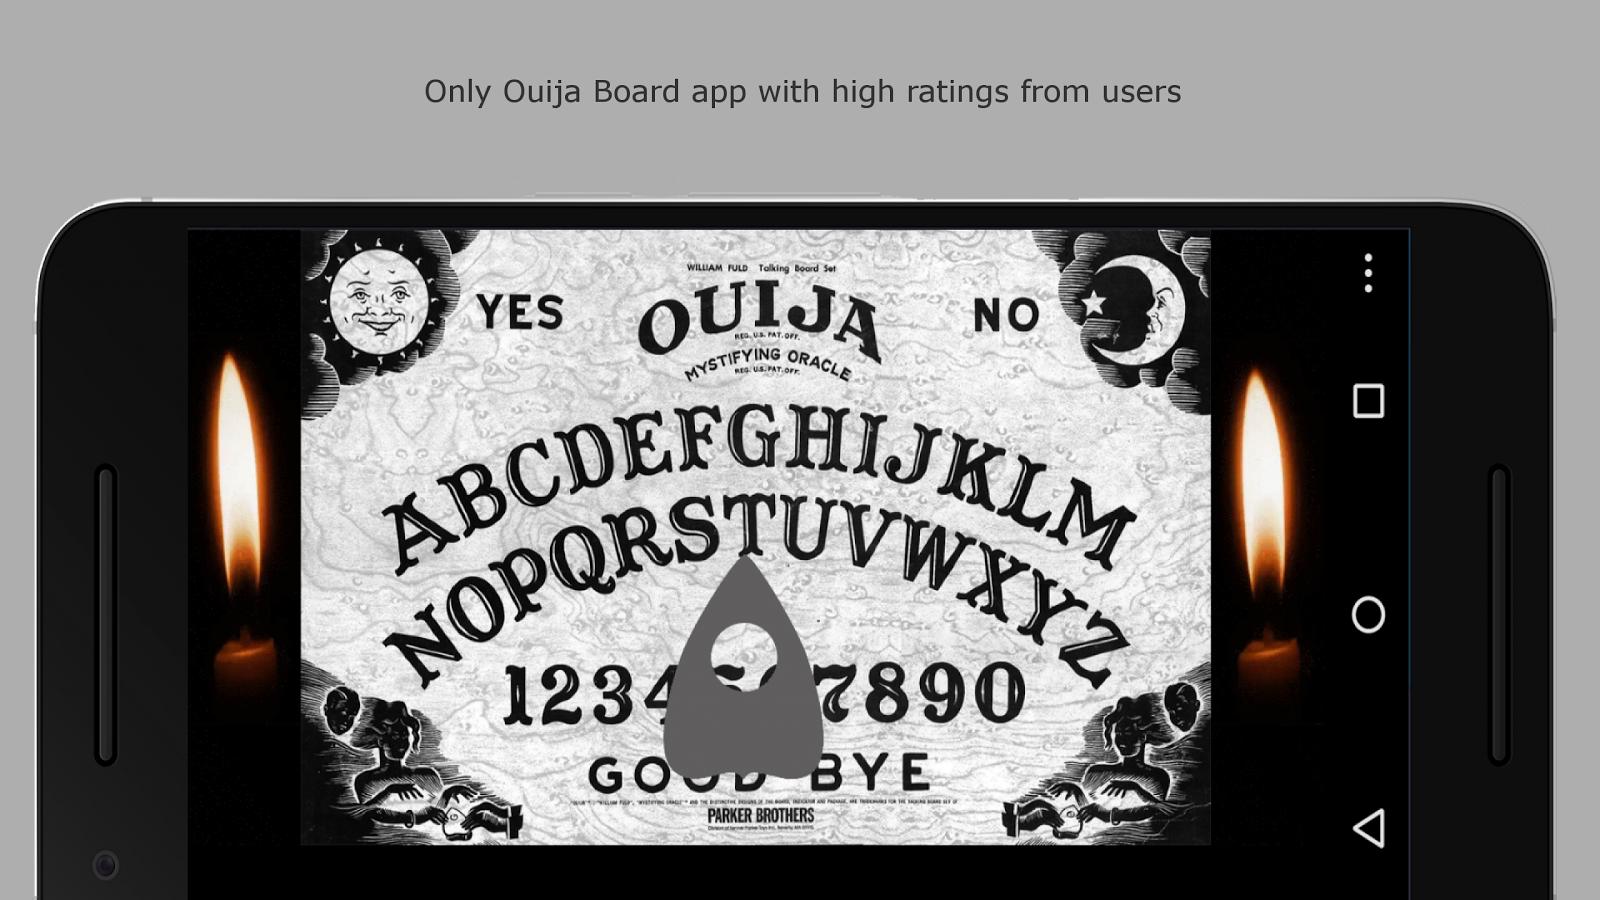 Ouija board pro 61 apk download android board games ouija board pro 61 screenshot 1 ouija board pro 61 screenshot 2 buycottarizona Gallery